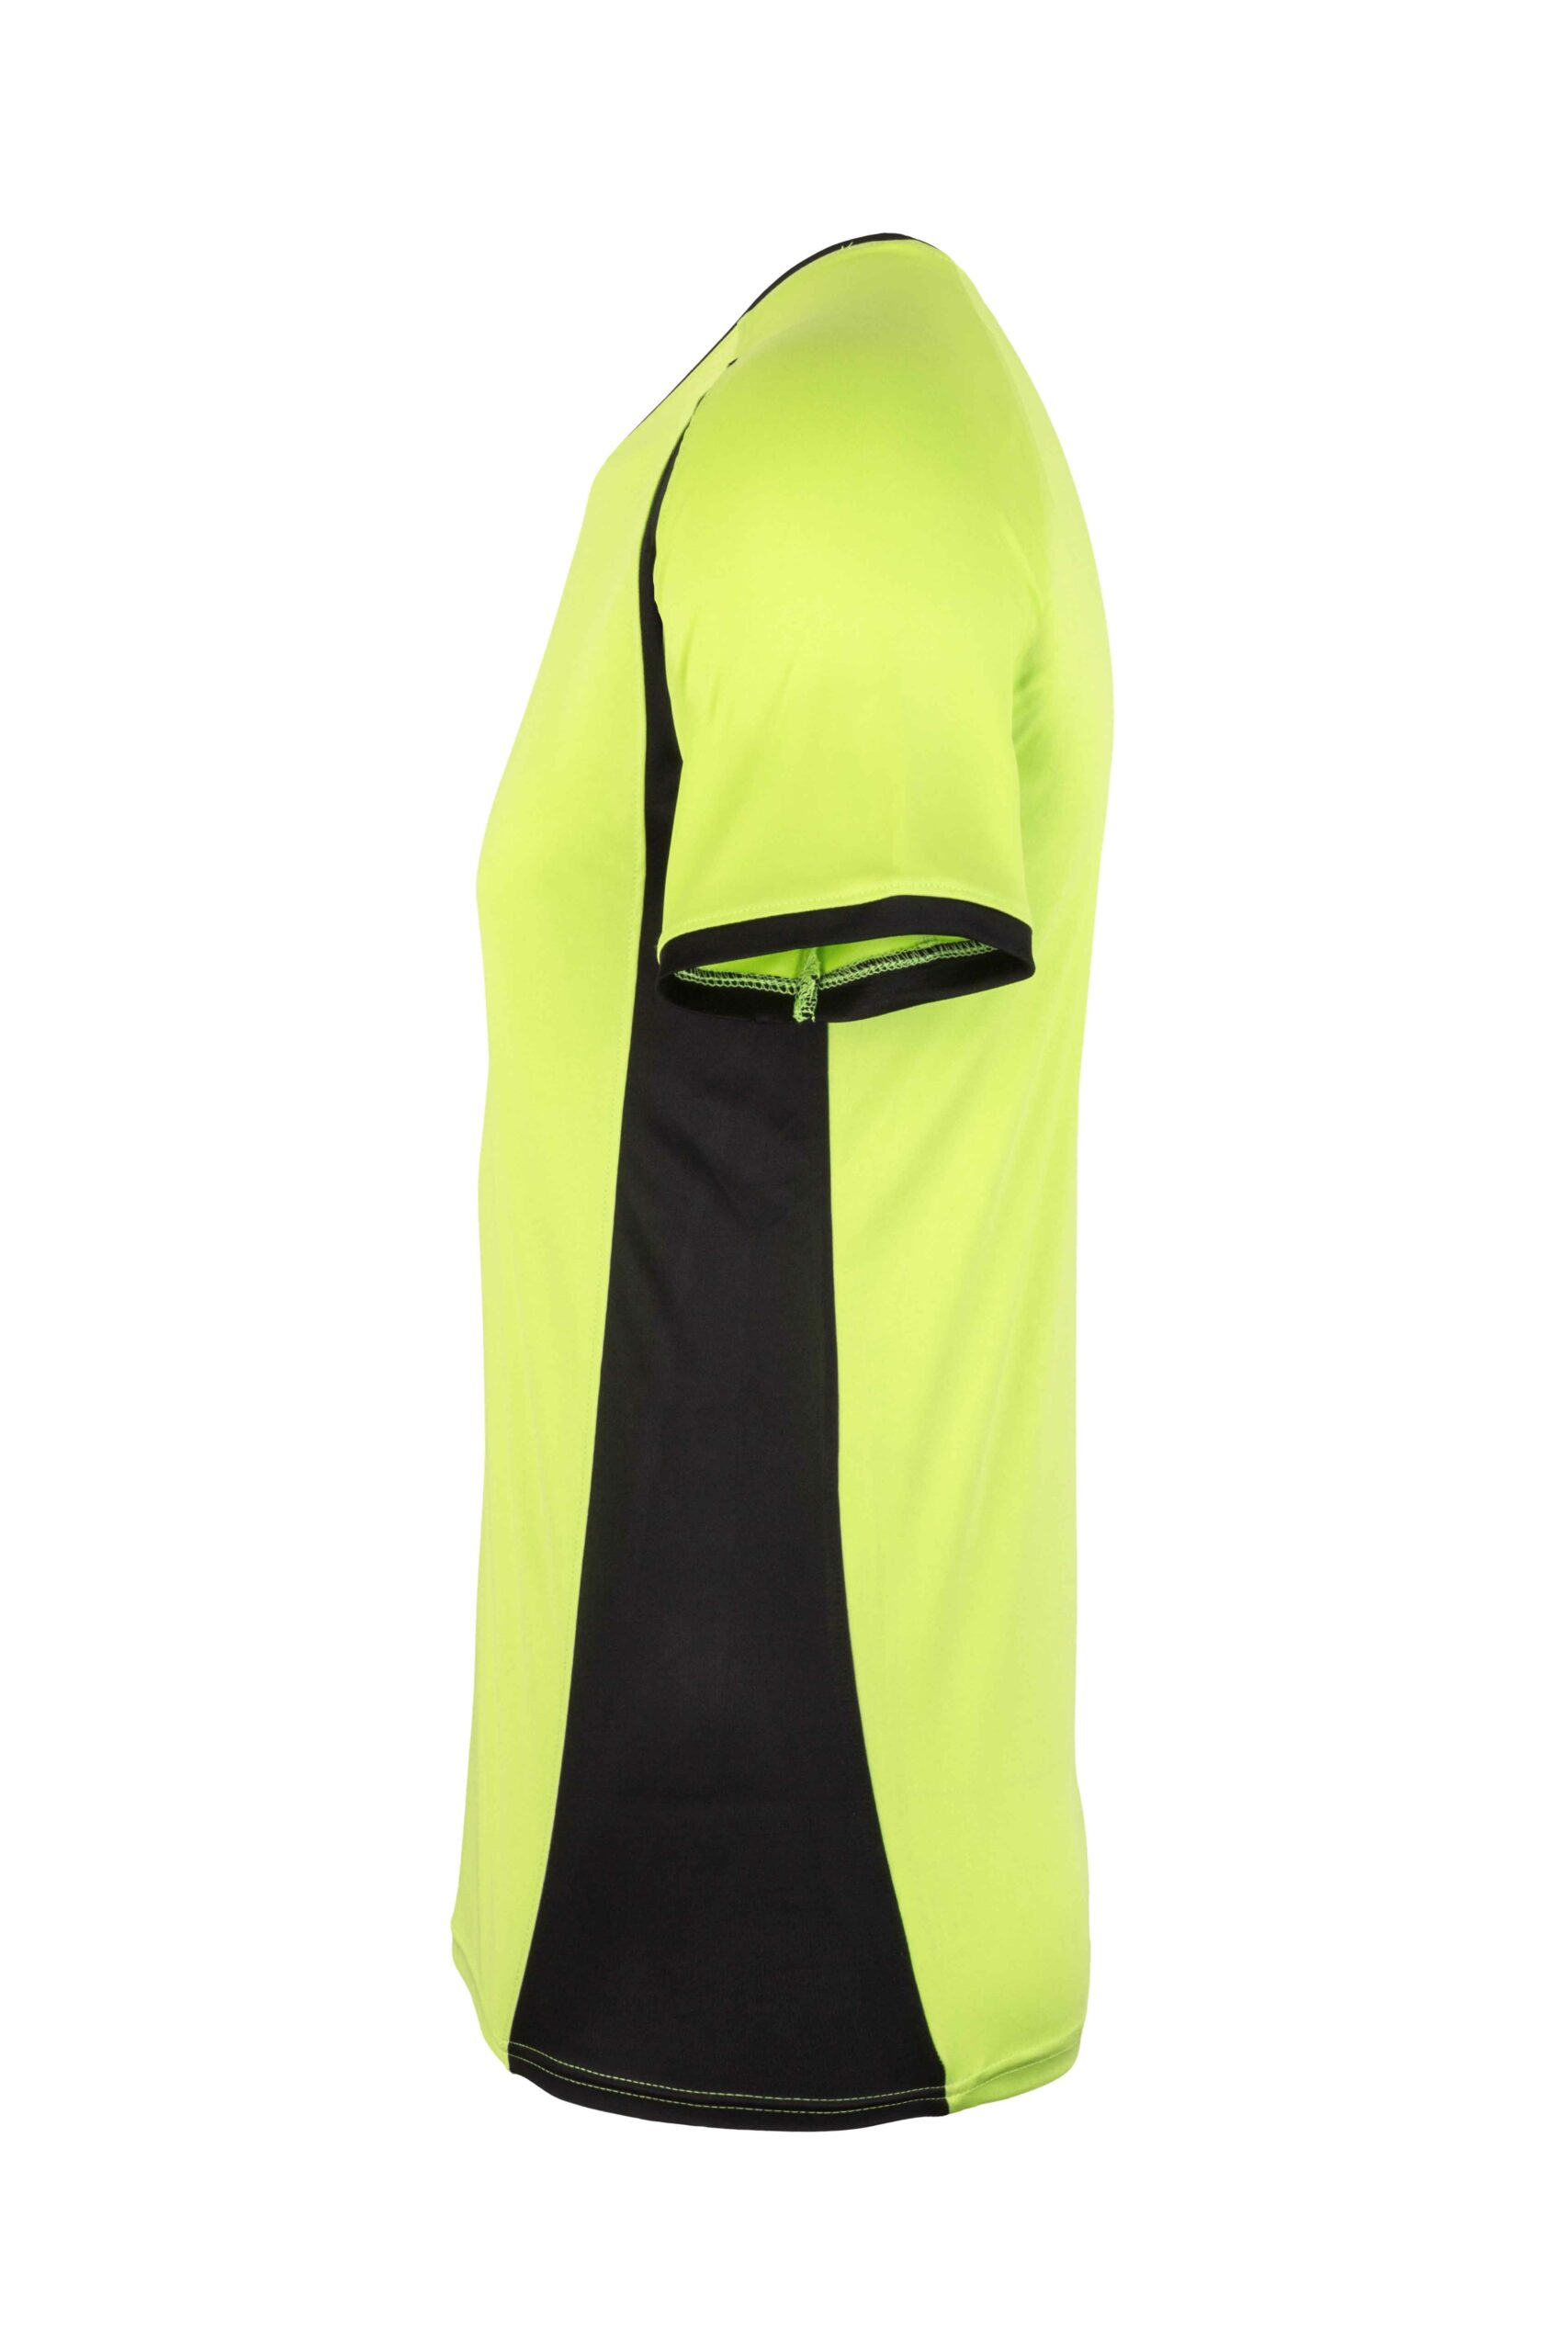 Mukua Mk530v Mukua Camiseta TÉcnica Manga Corta Bicolor Lime Blak 3